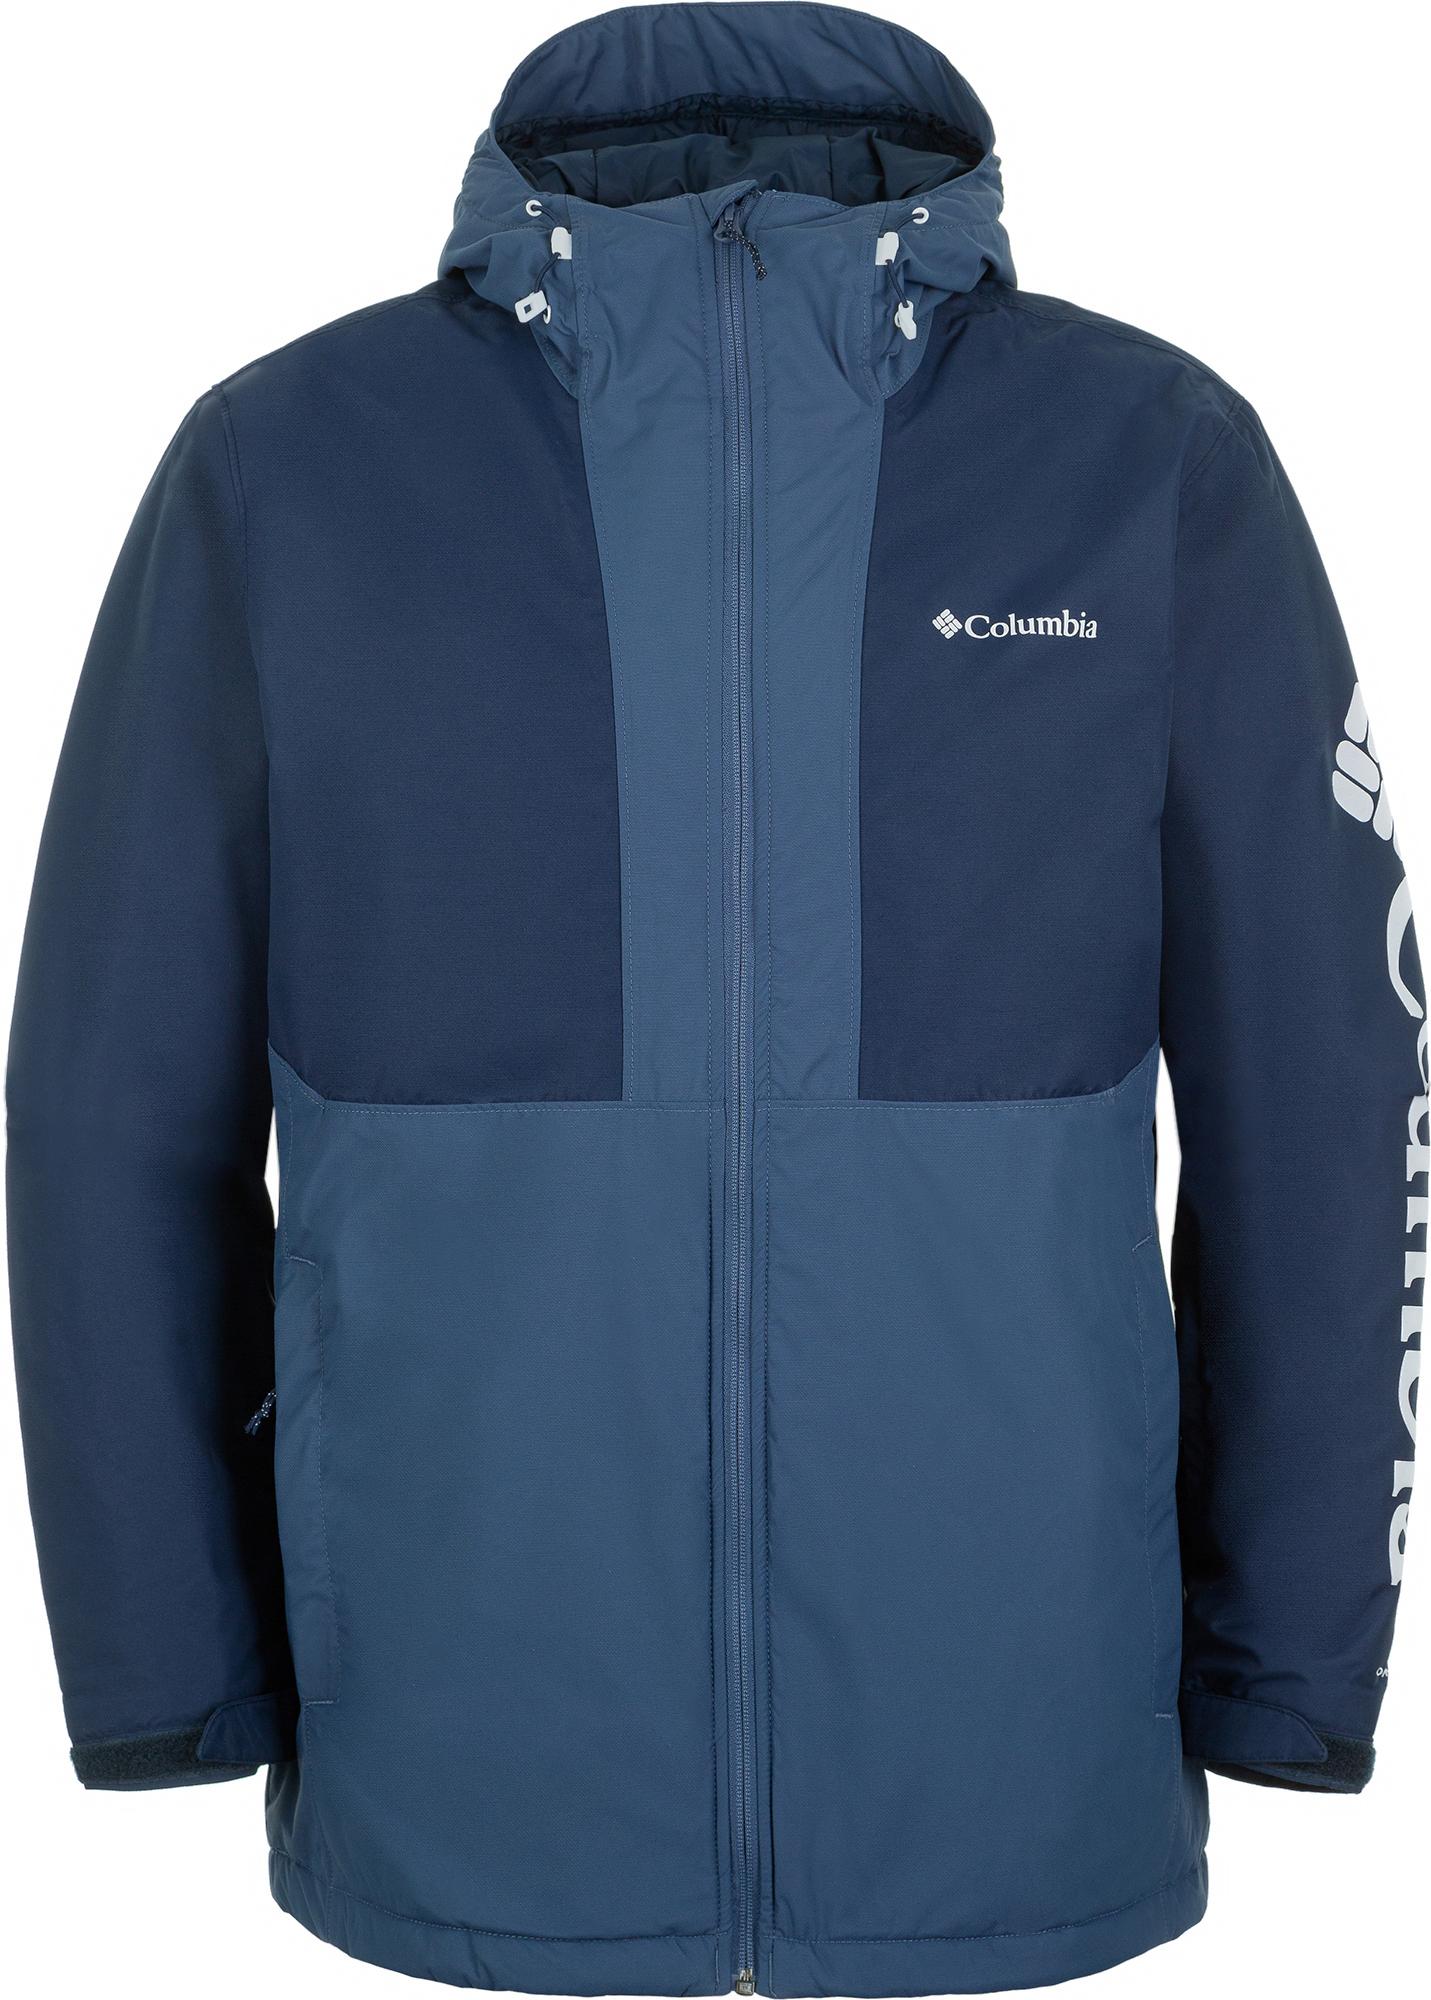 Columbia Куртка утепленная мужская Columbia Timberturner, размер 48-50 куртка хольстер утепленная смес ткань 48 50 170 176 лес 2010